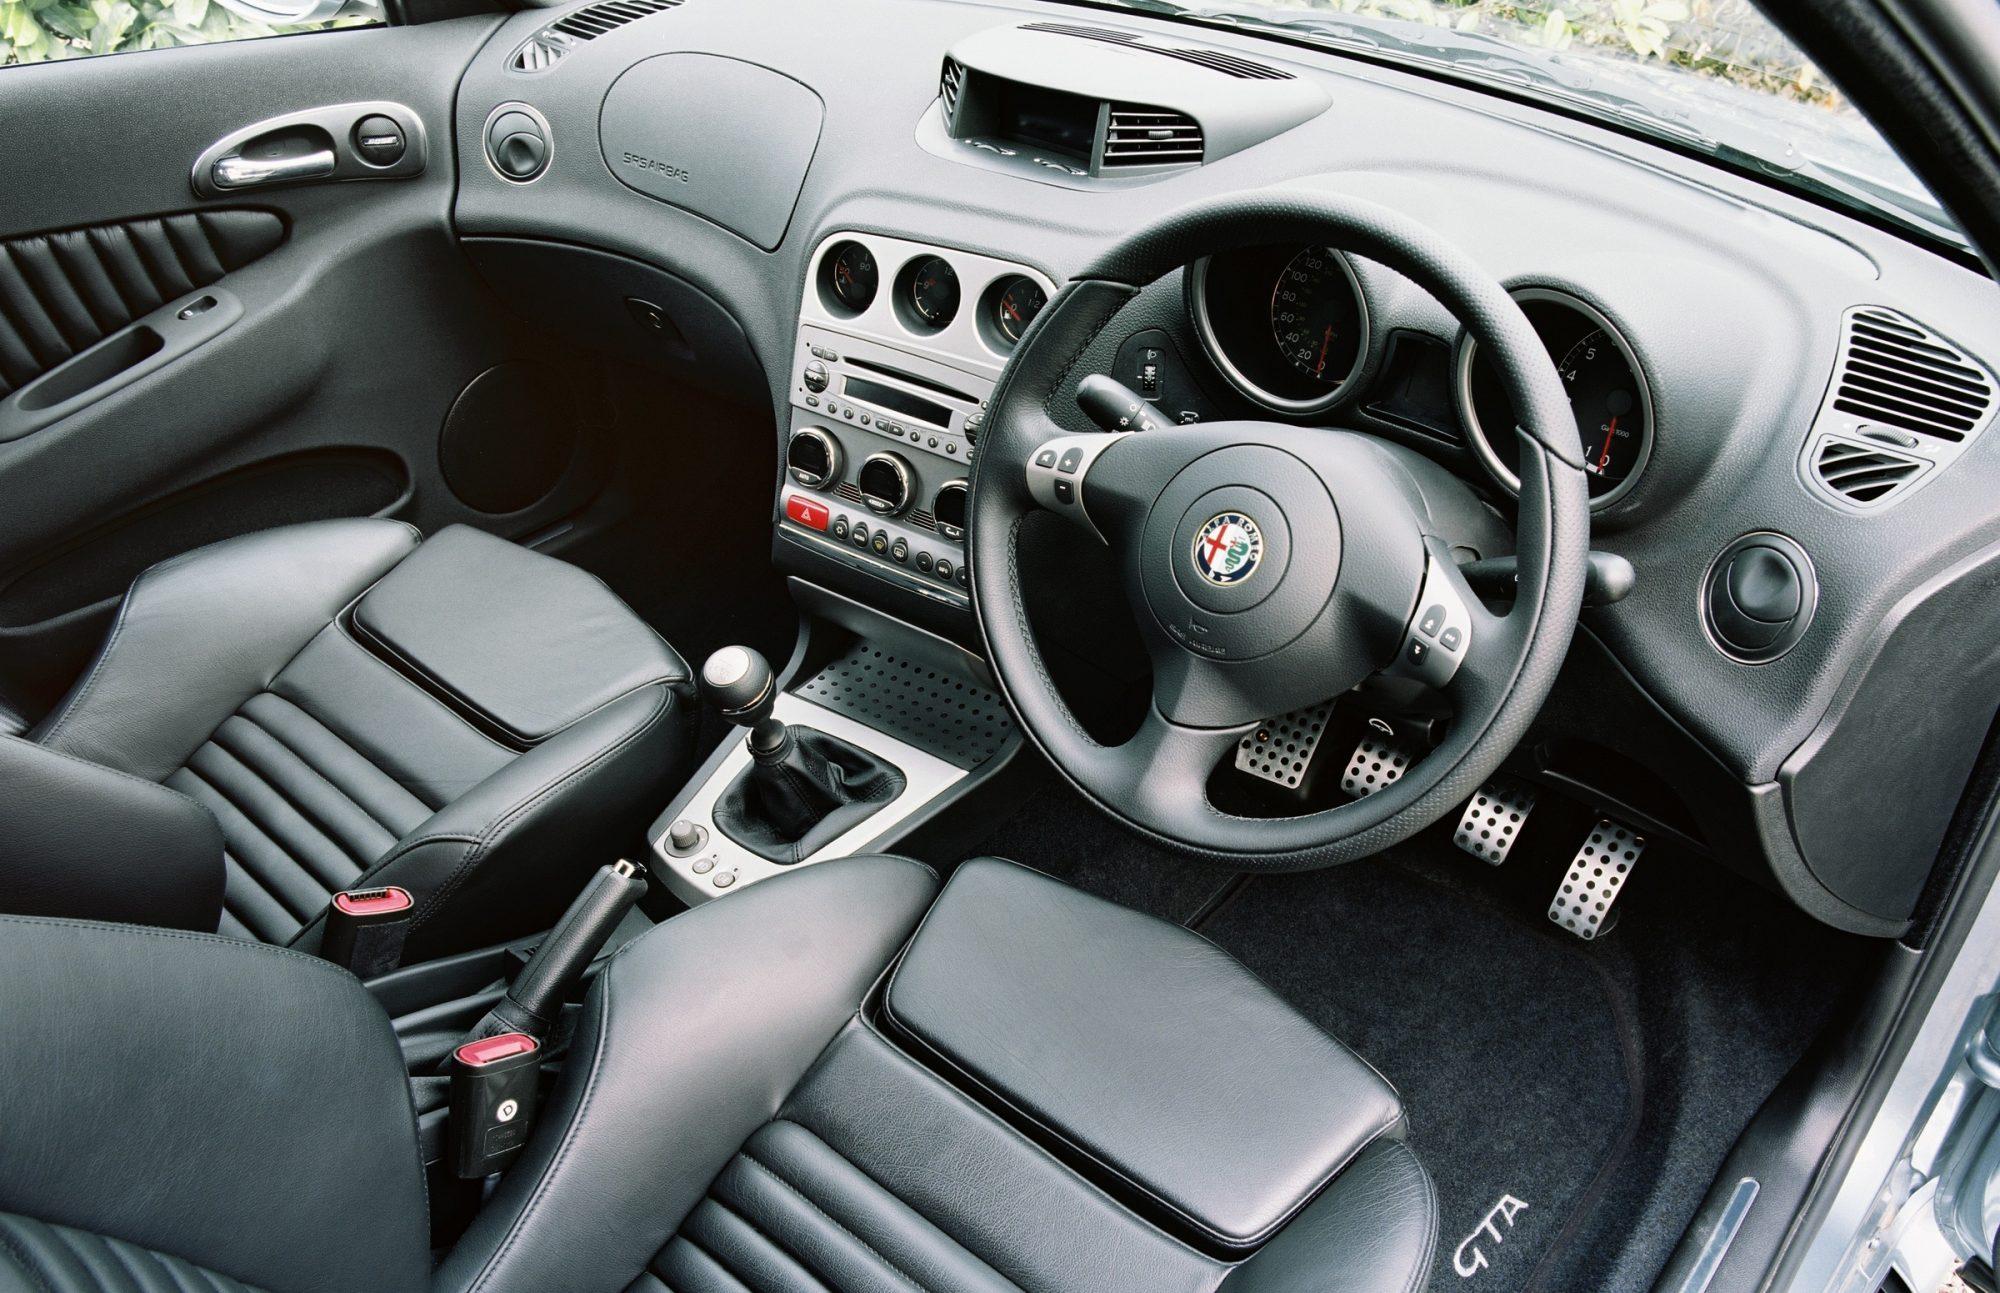 Alfa Romeo, Alfa Romeo GTA, 156 GTA, busso, V6, classic car, retro car, motoring, automotive, carandclassic, carandclassic.co.uk, cult classic, Alfa Romeo 156 GTA,